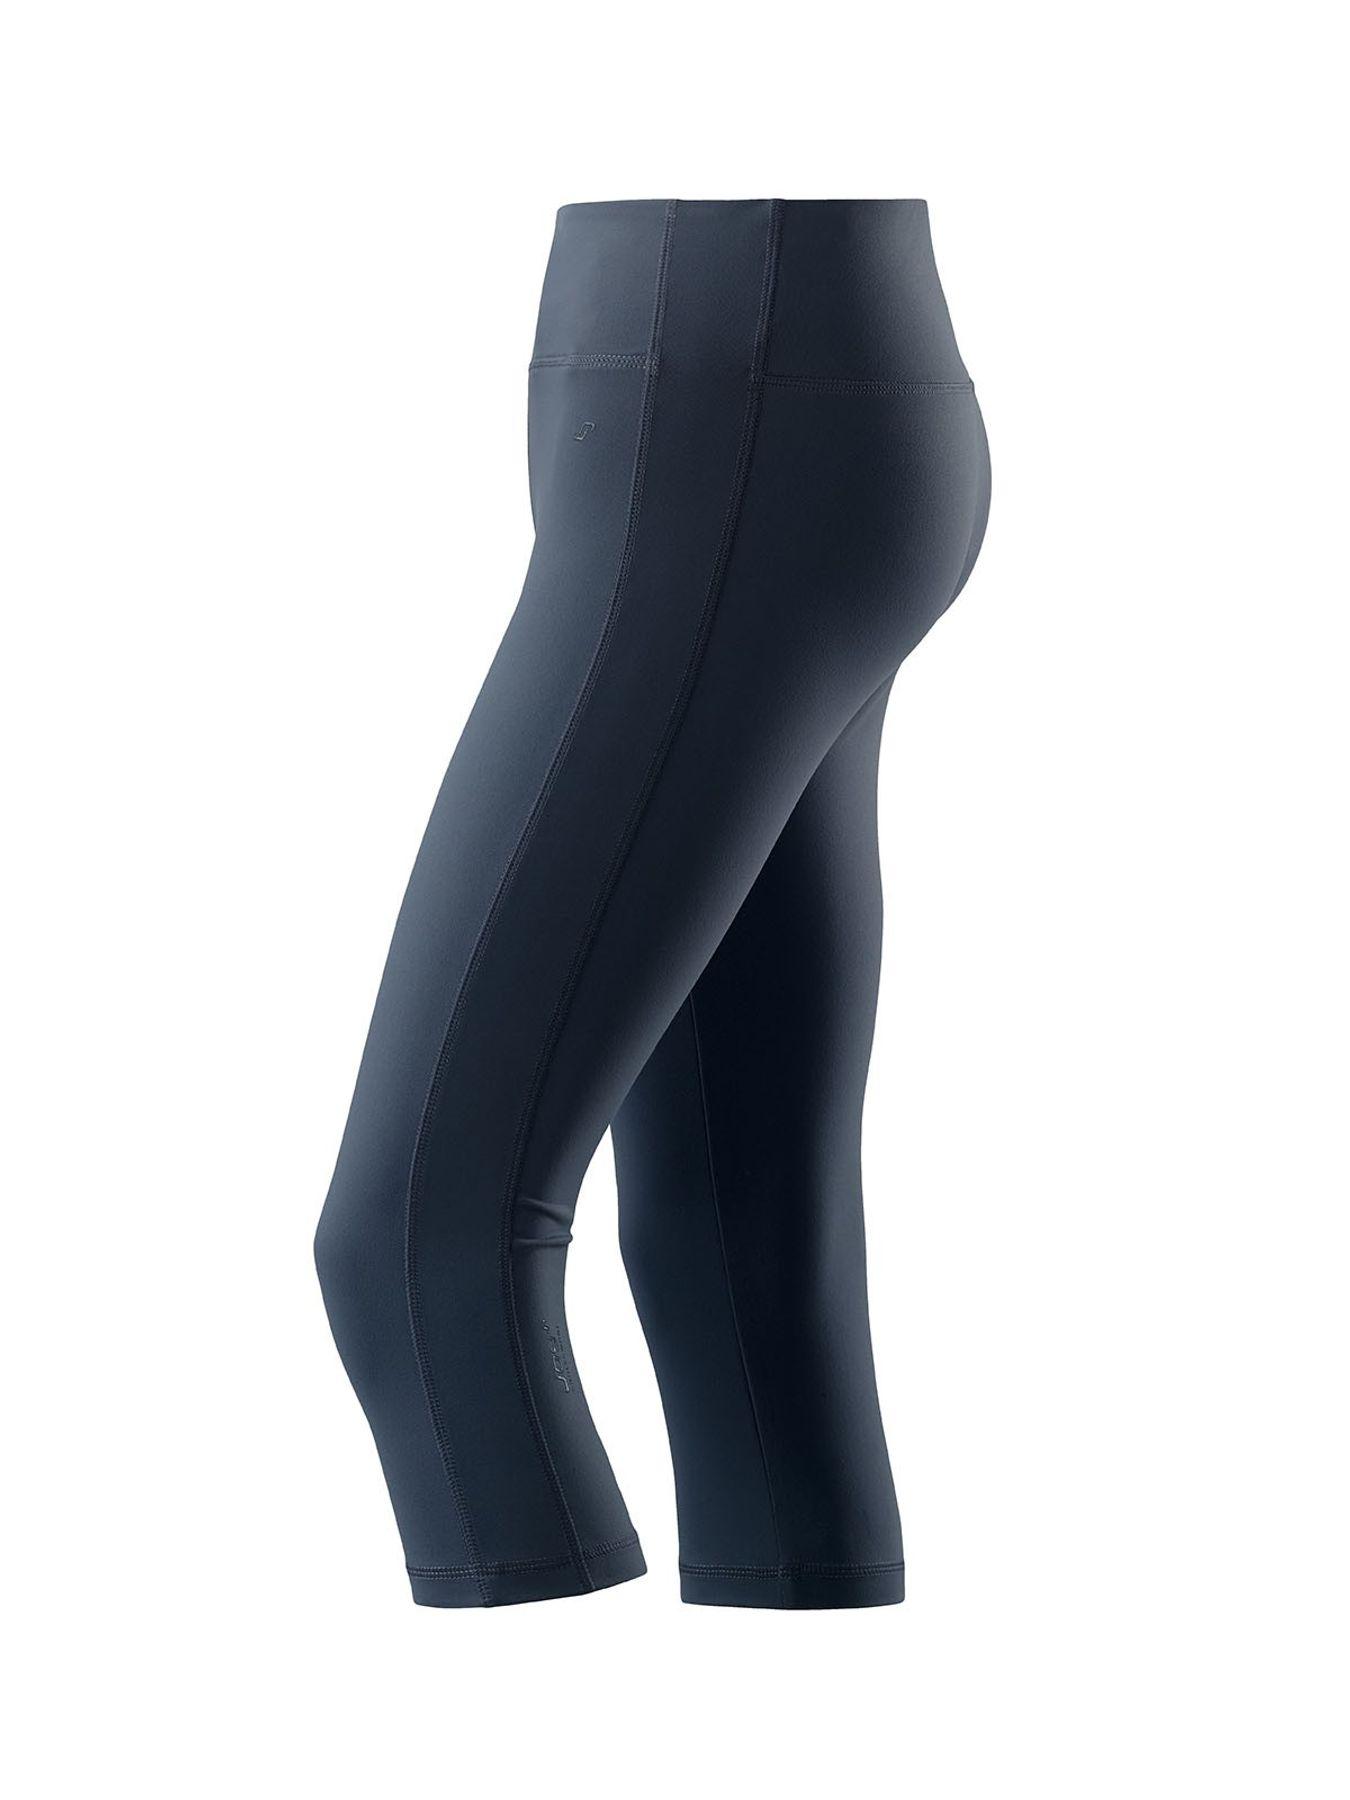 Joy - Bodyfit - Damen 3/4 Hose mit Shaping-Effekt, Susanna (30142) – Bild 4